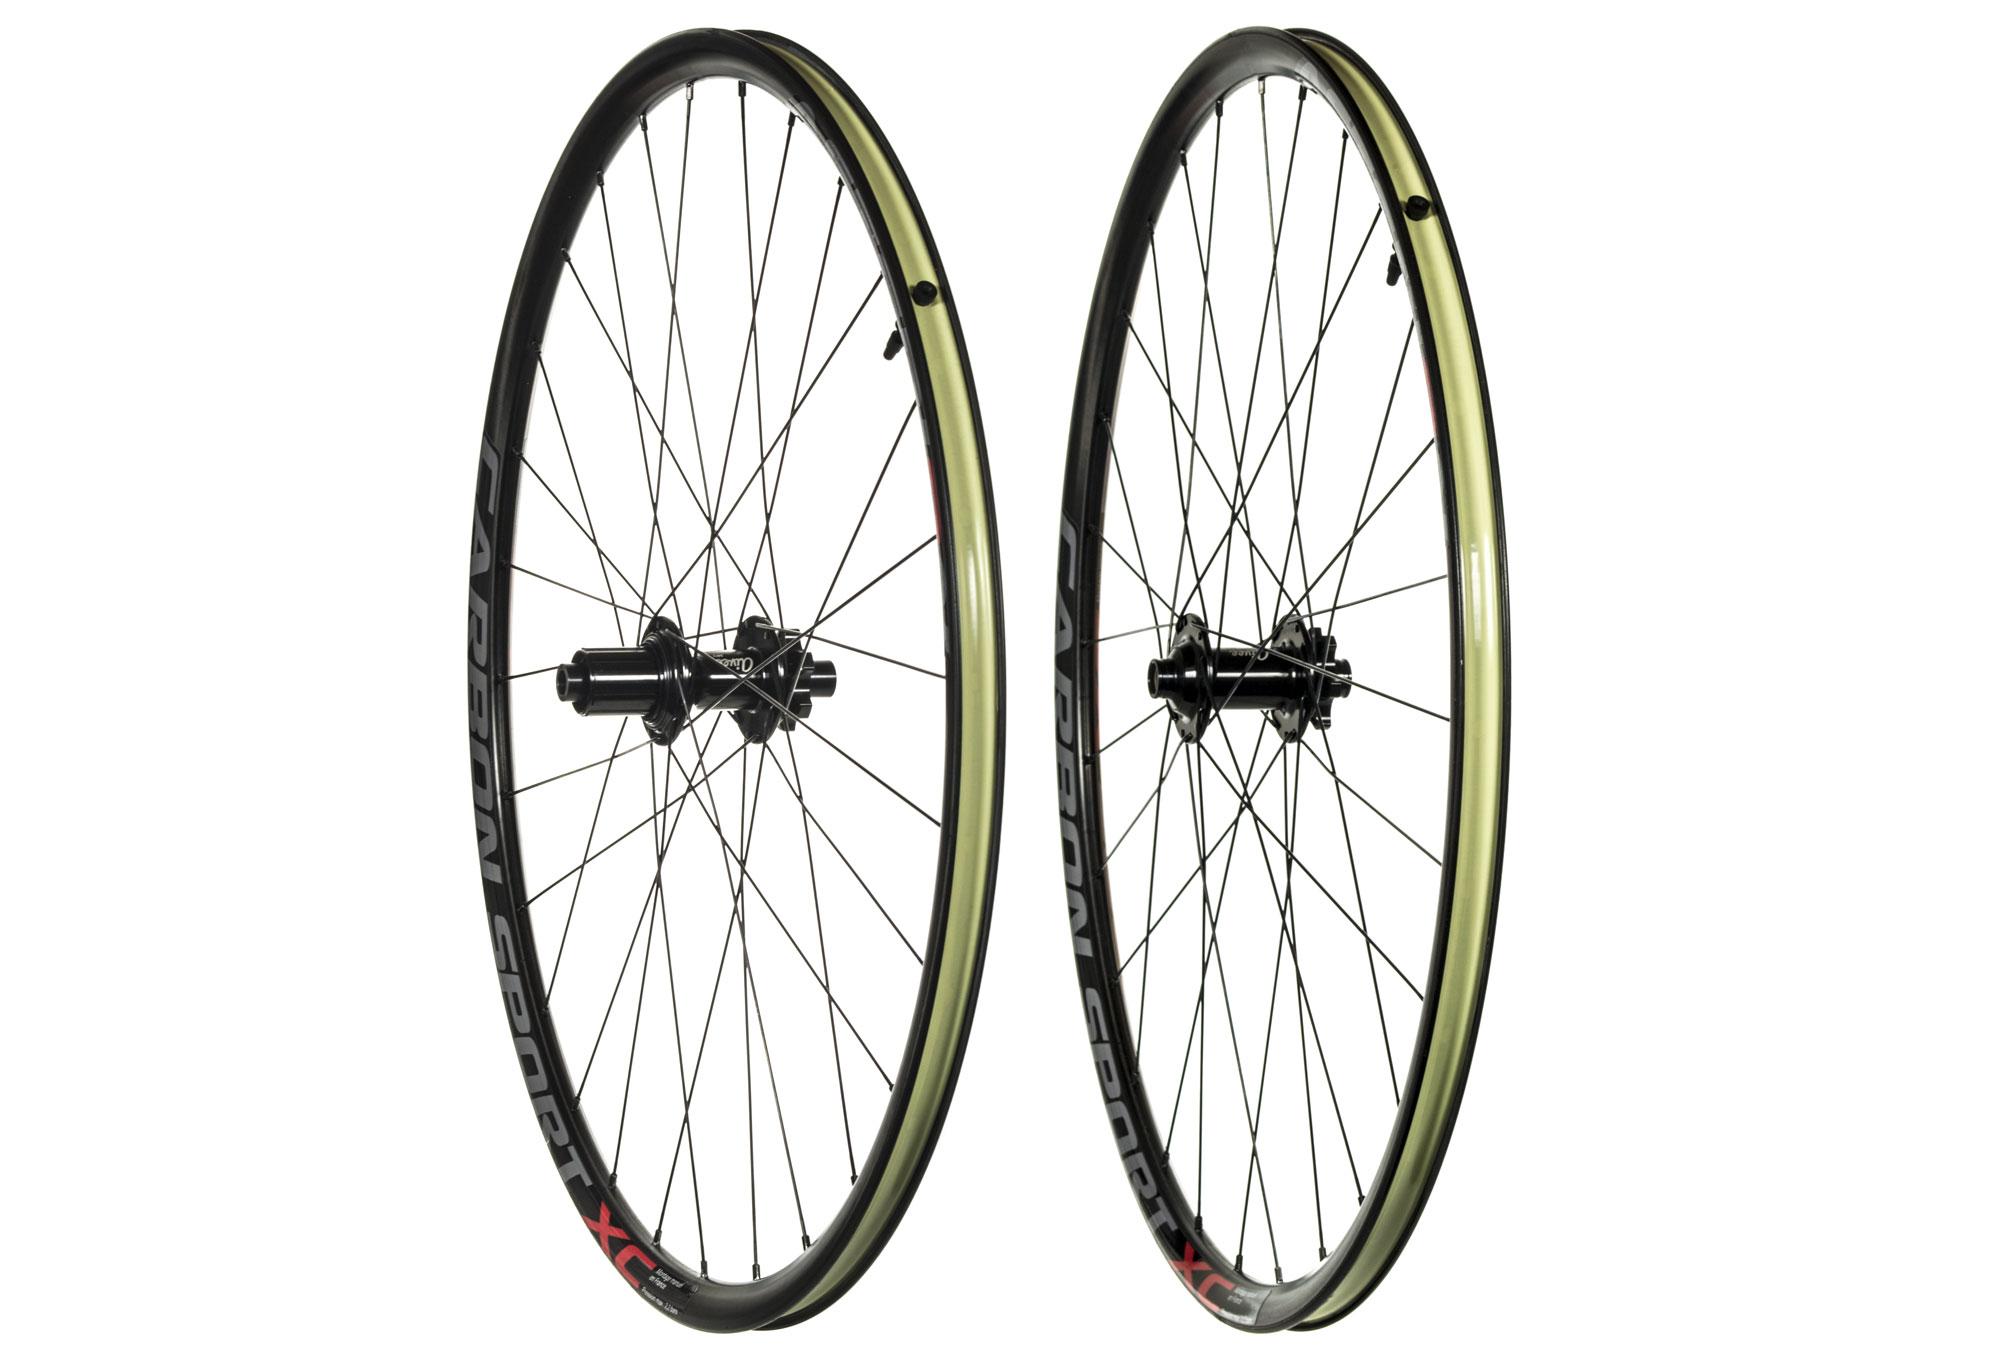 paire de roues asterion carbon sport xc 29 15x100 12x142mm corps shimano sram tl ready. Black Bedroom Furniture Sets. Home Design Ideas